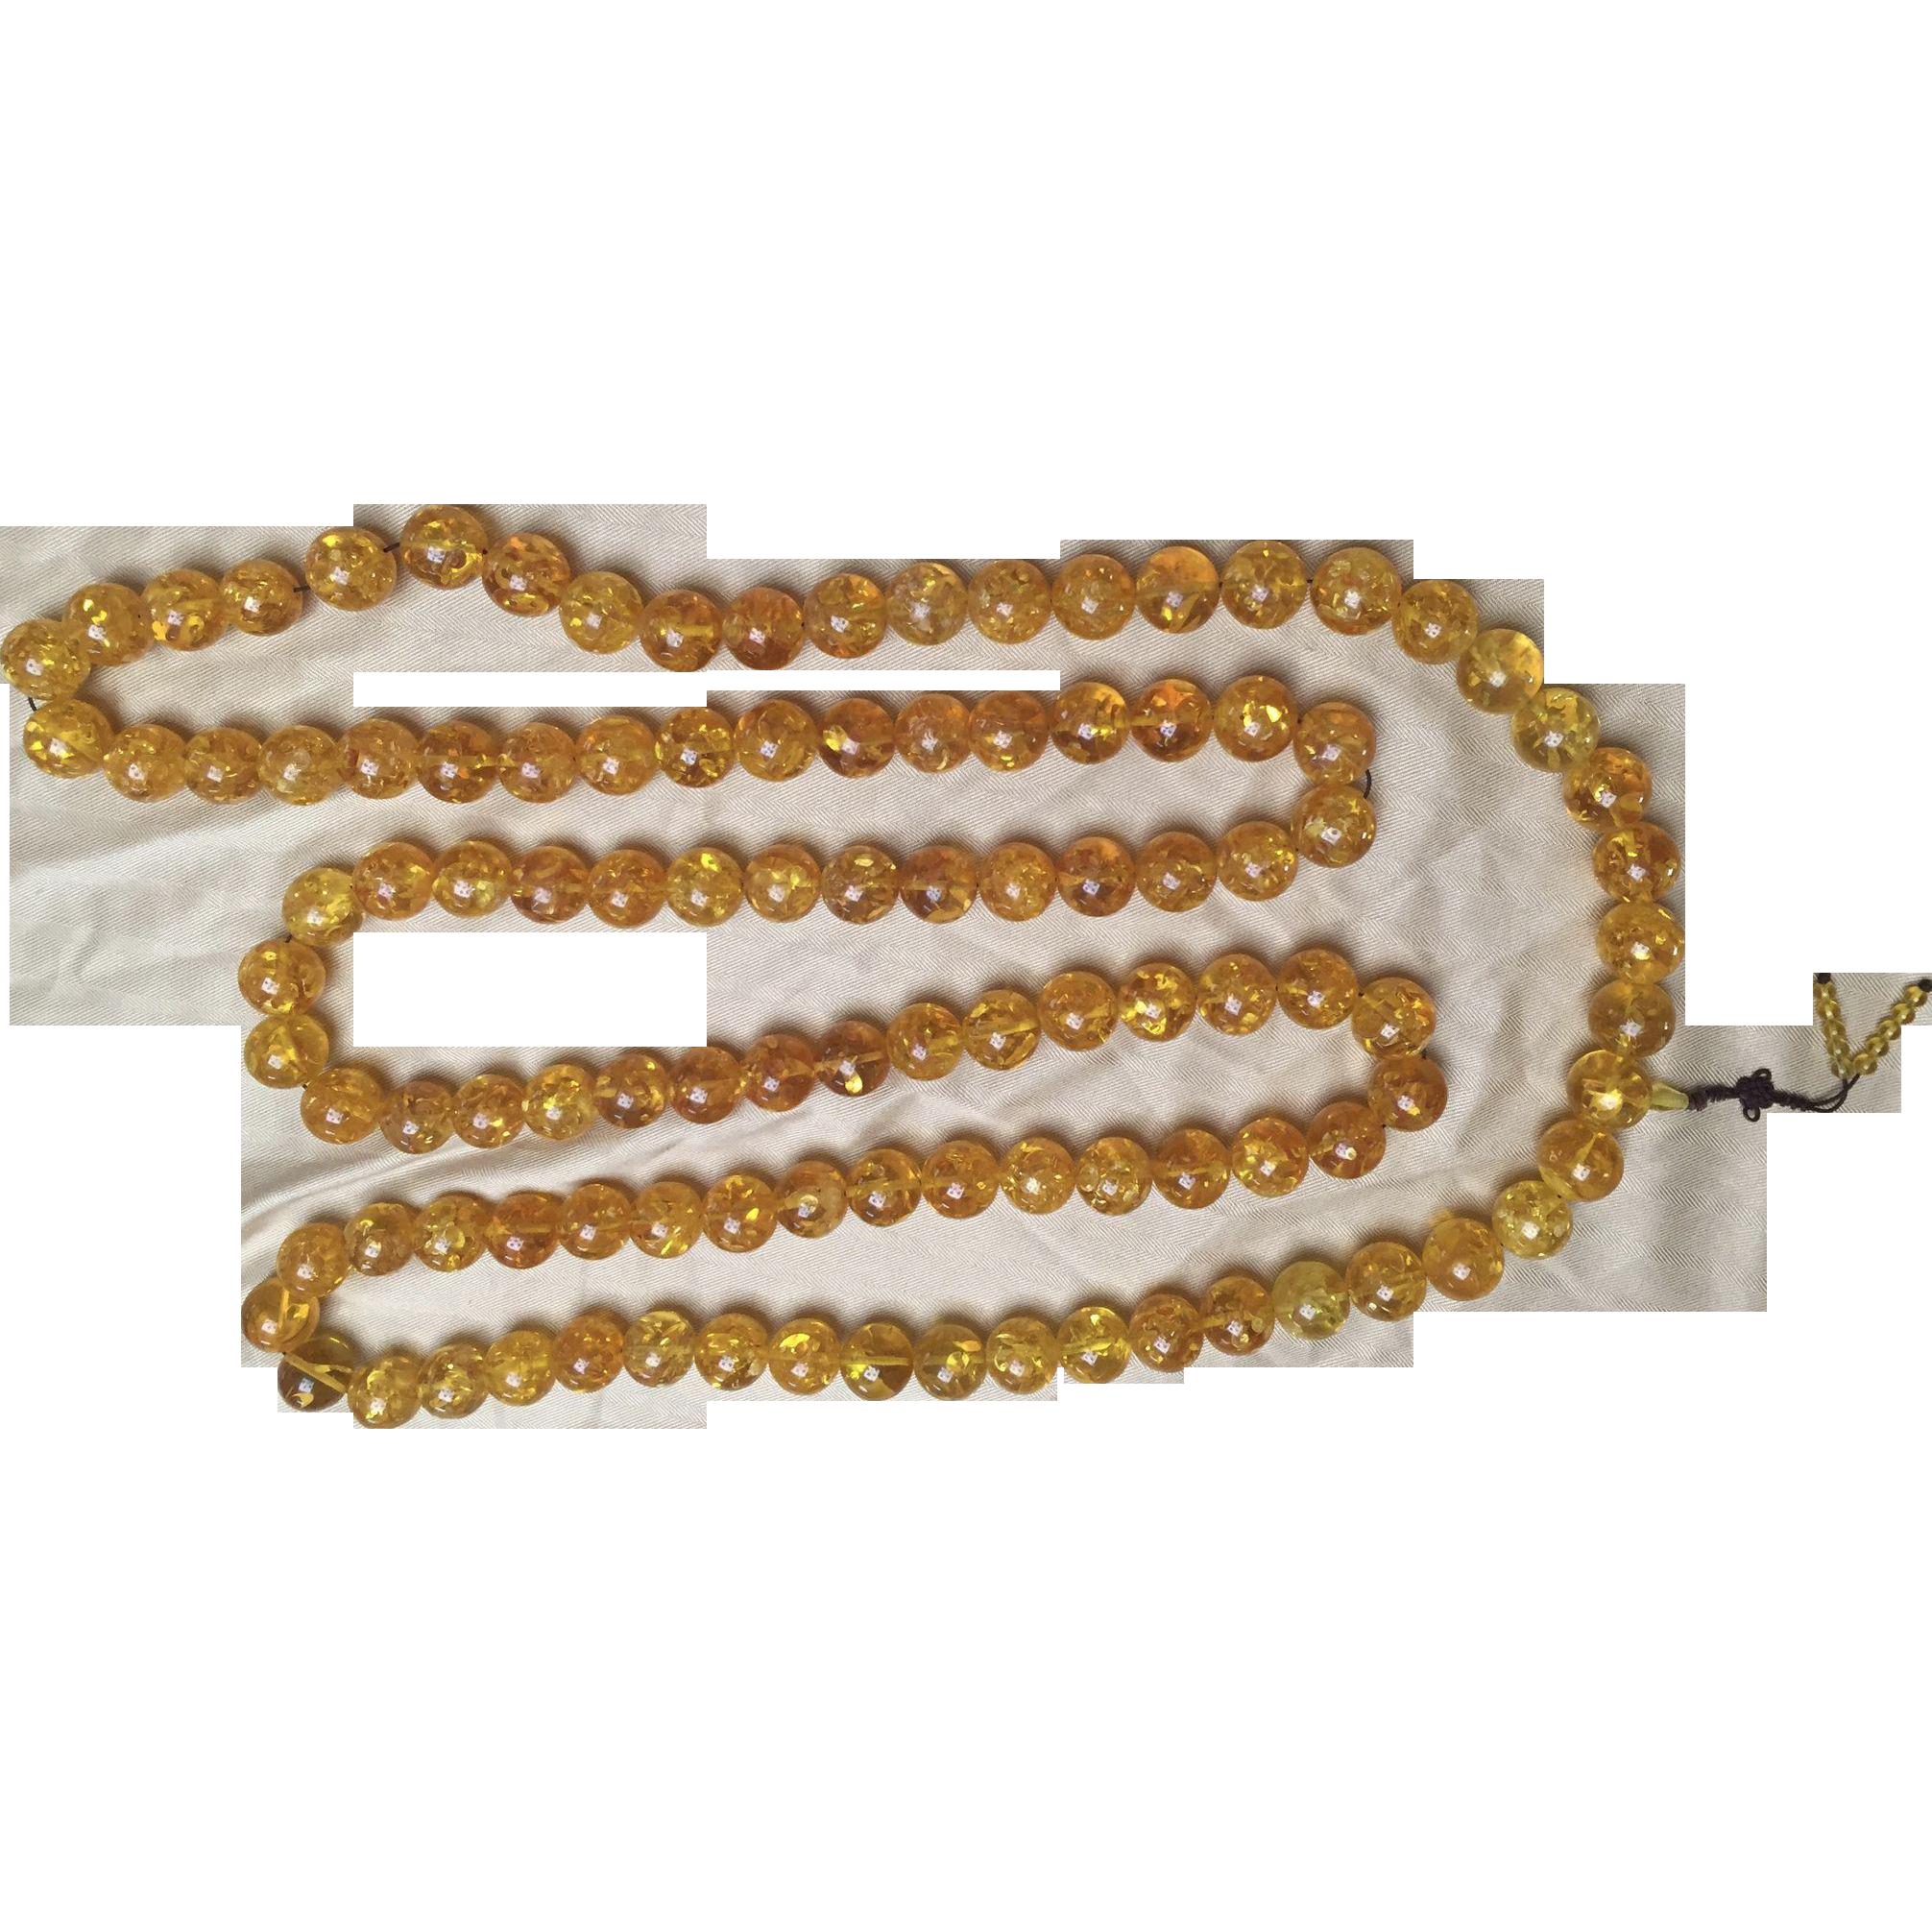 Colossal Prayer Necklace Amber/Like